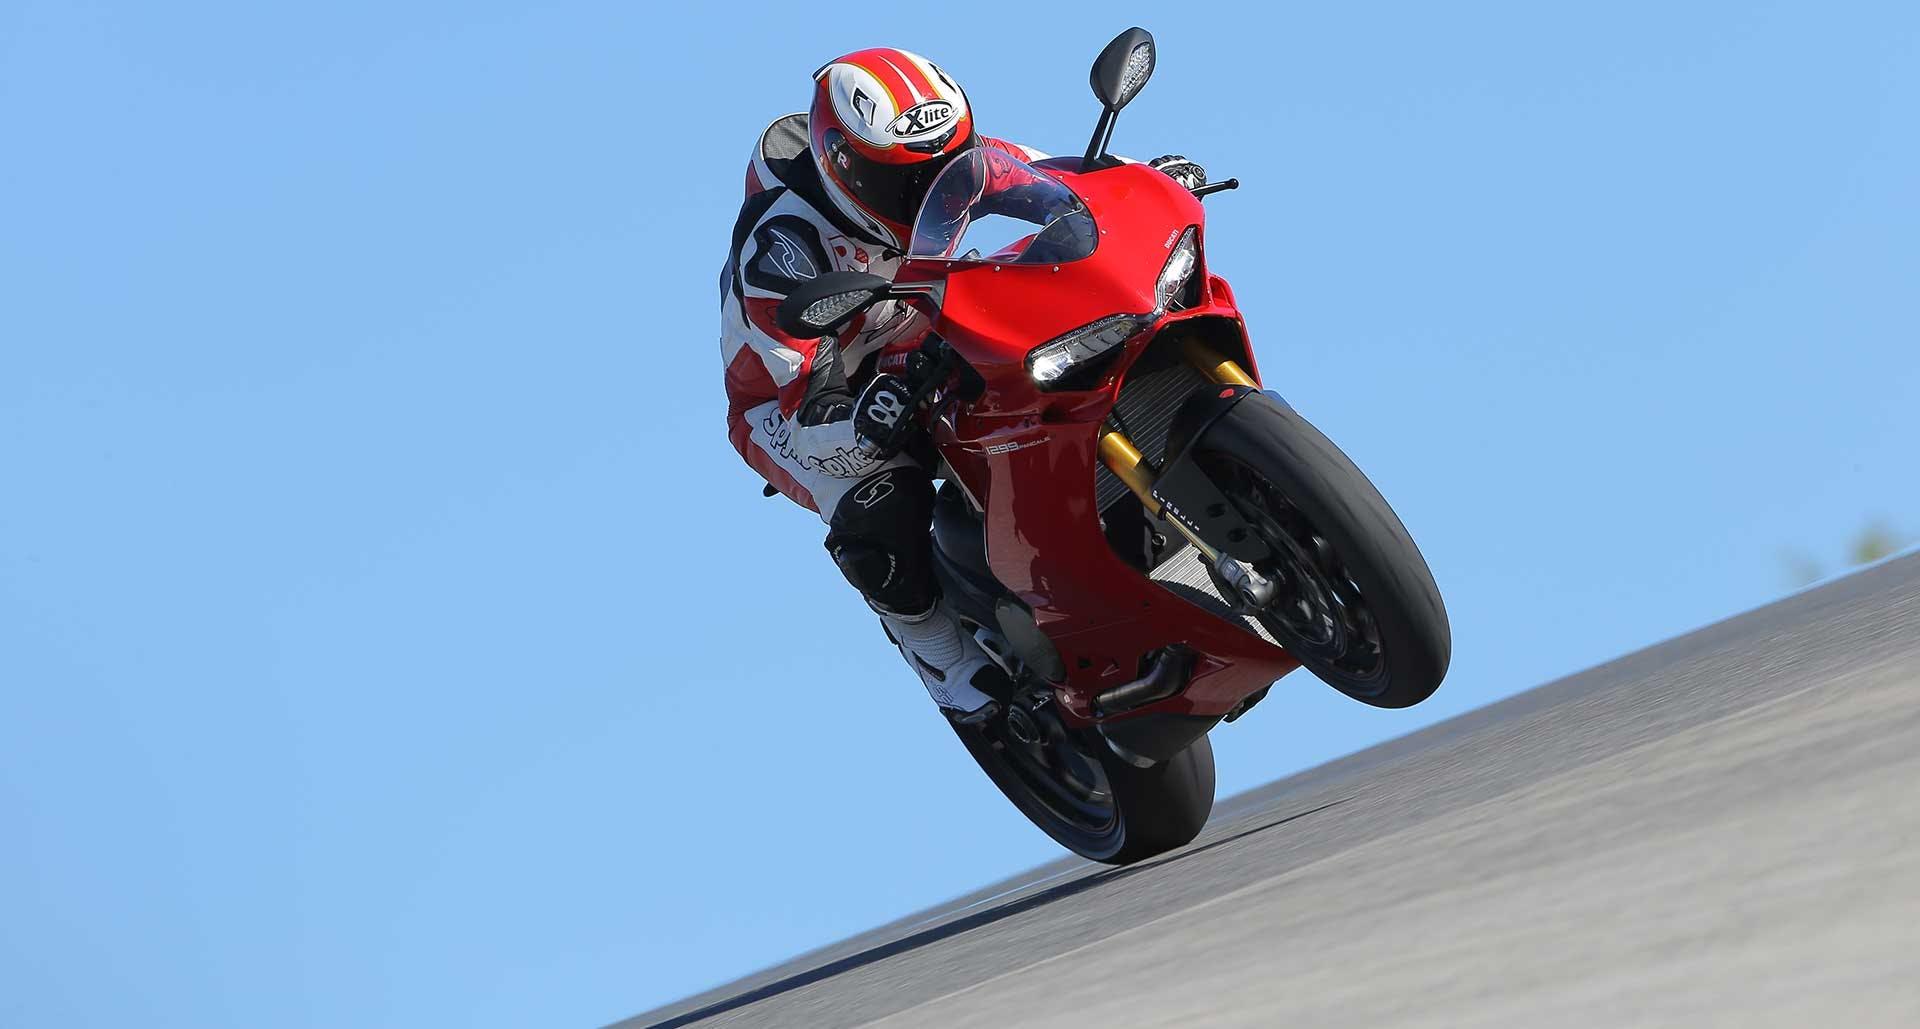 DucatiPanigale1299S-041